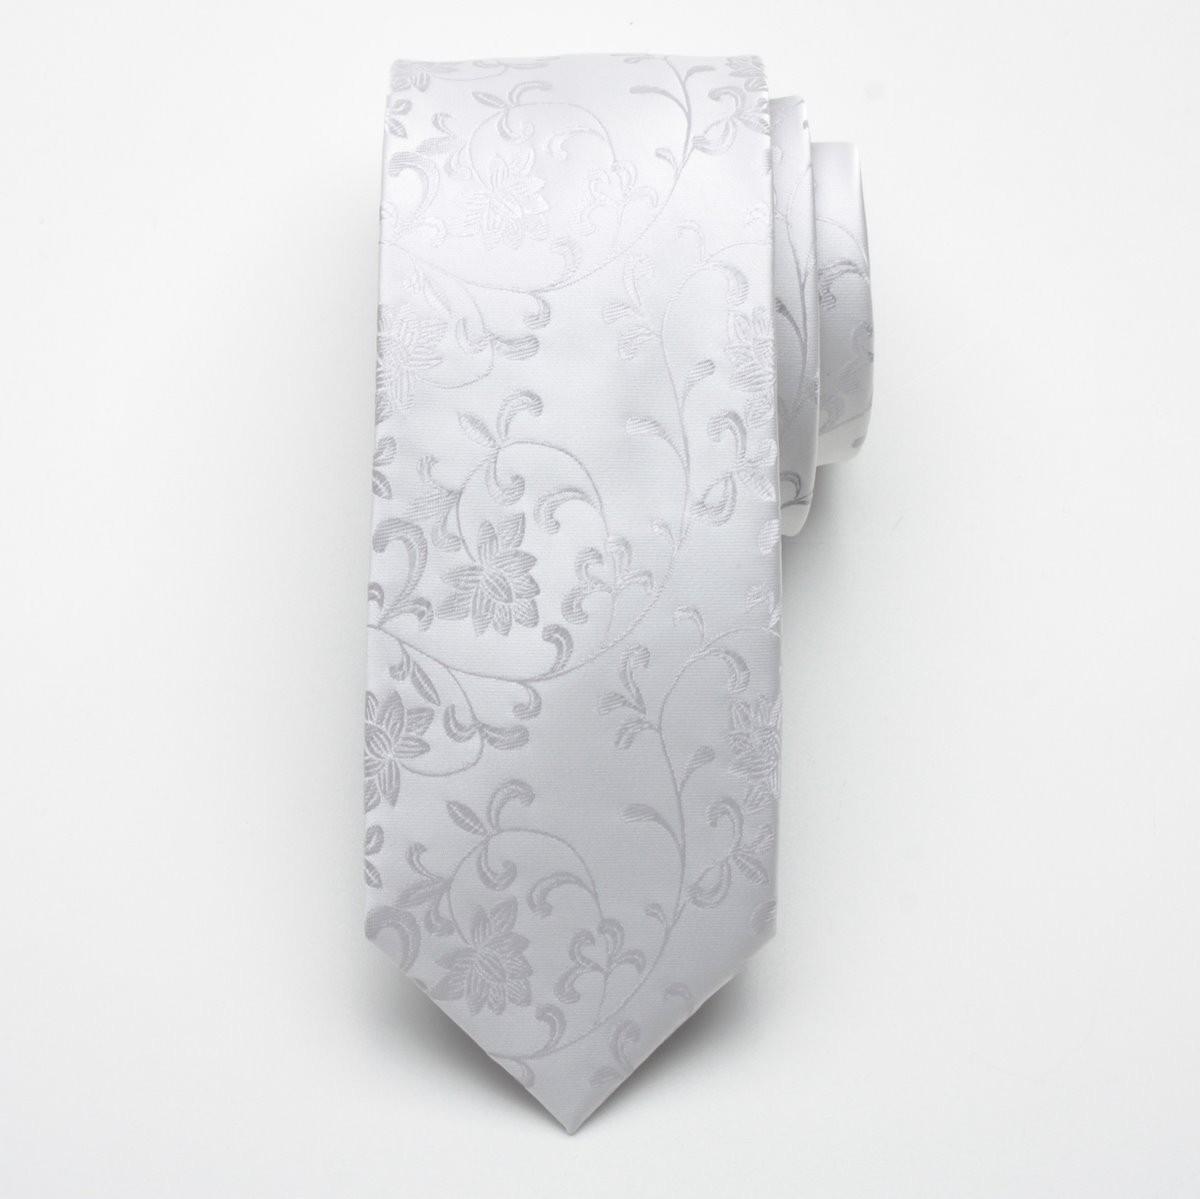 Krawat ślubny (wzór 4)